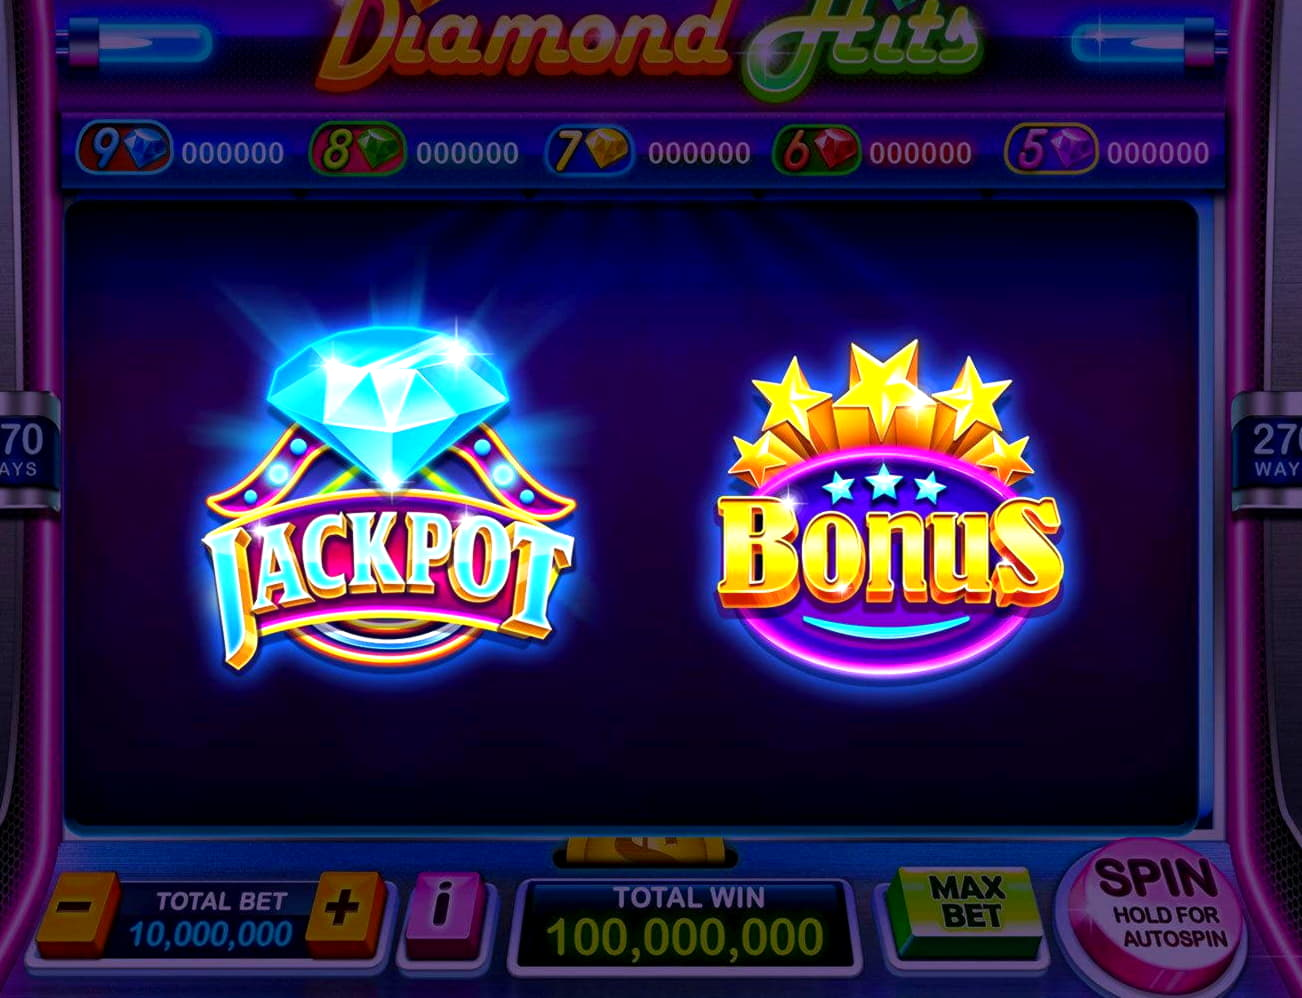 $1245 No deposit casino bonus at Wild Slots Casino